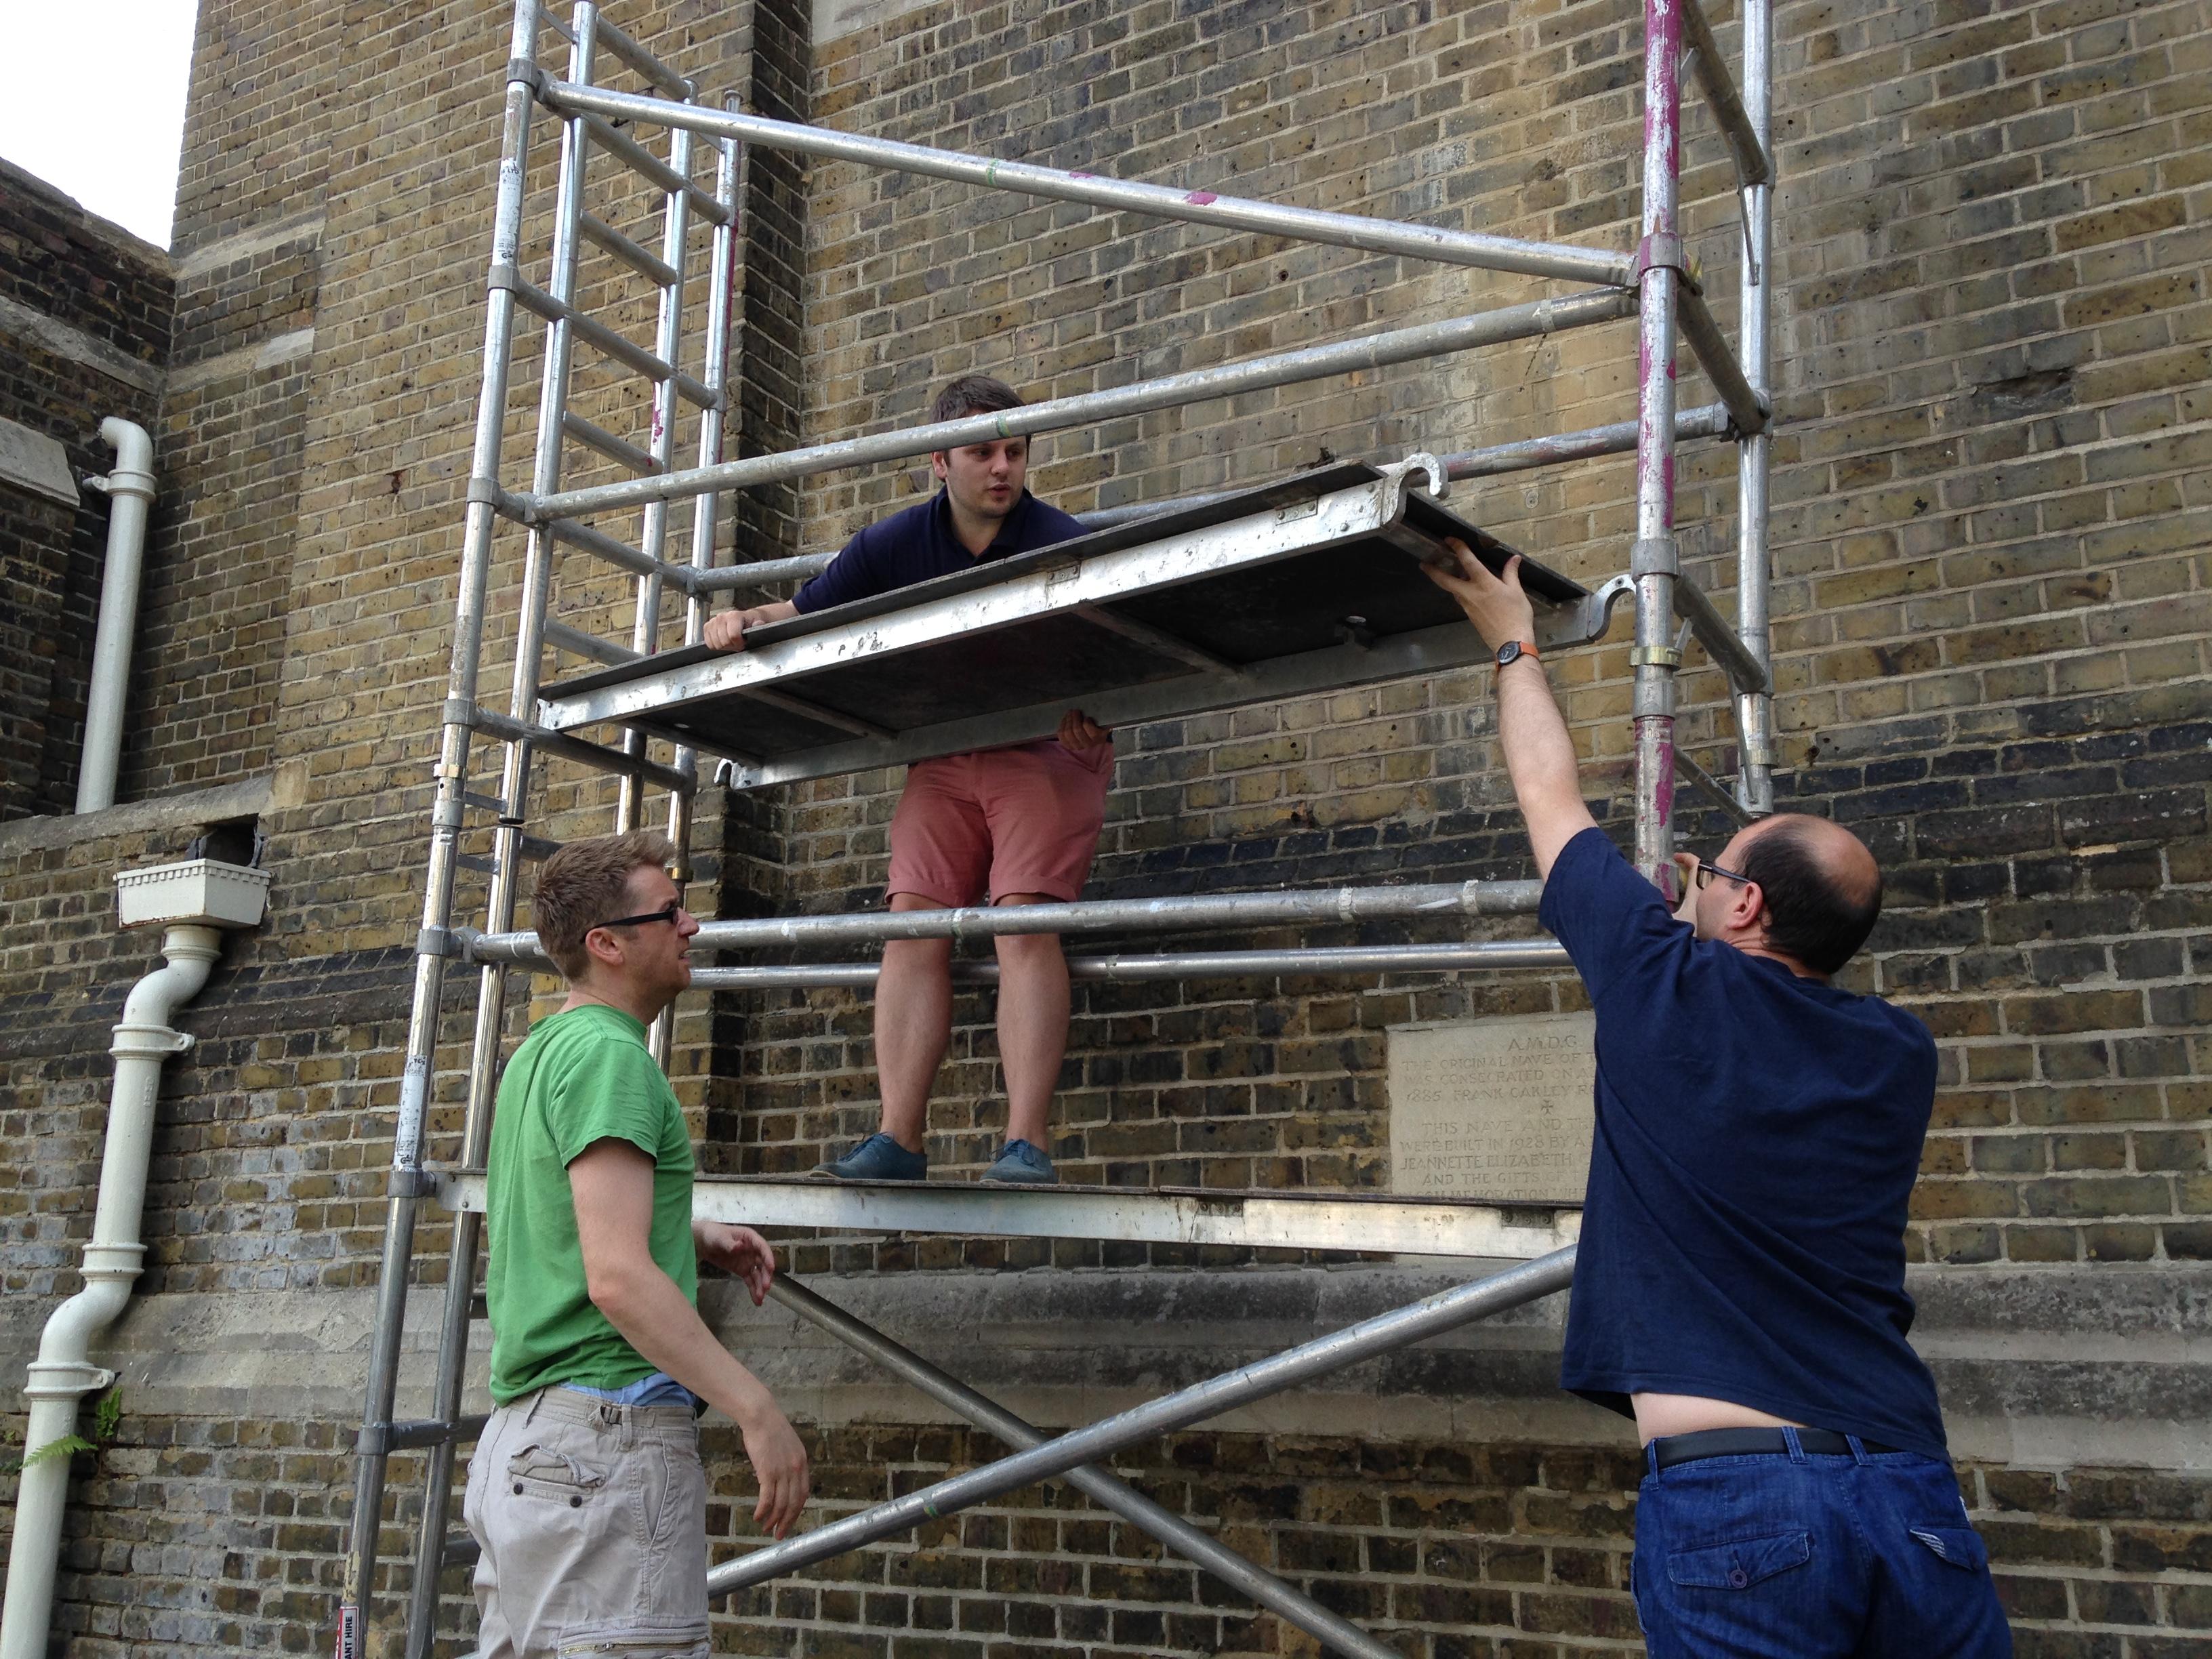 Here is William Hamilton-Box heroically erecting scaffolding!